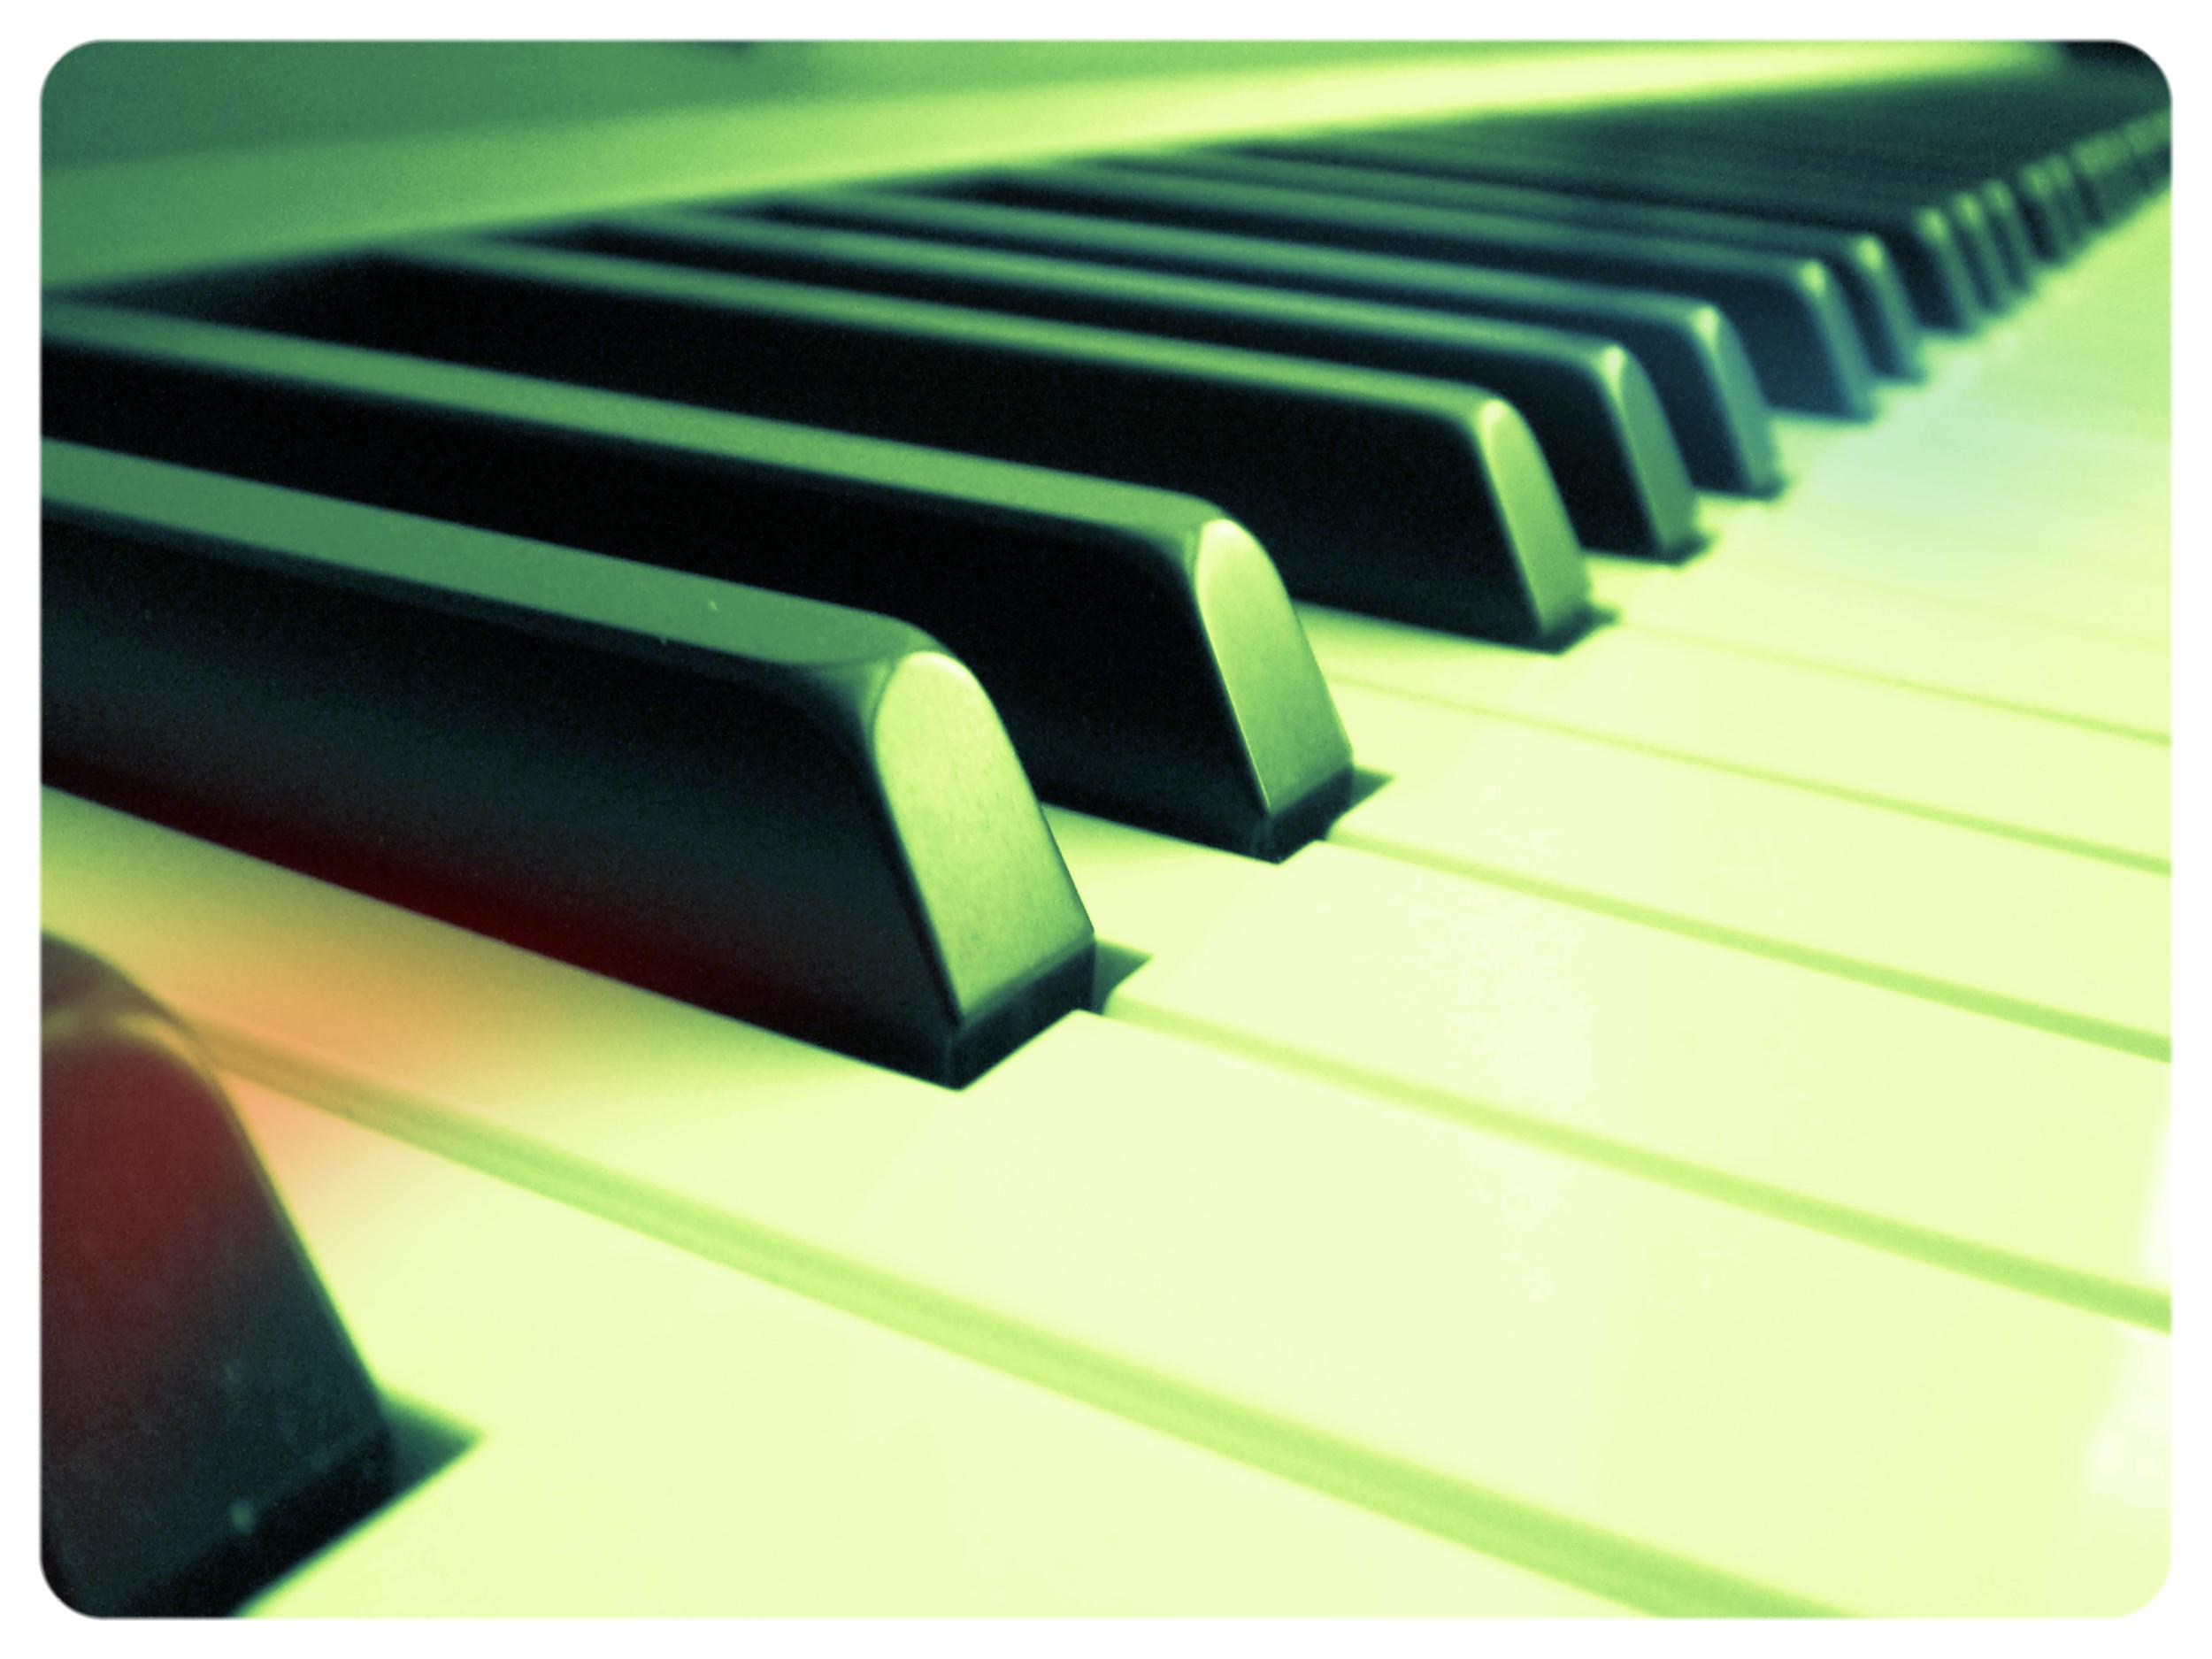 Jose Eboli Keyboard.jpg